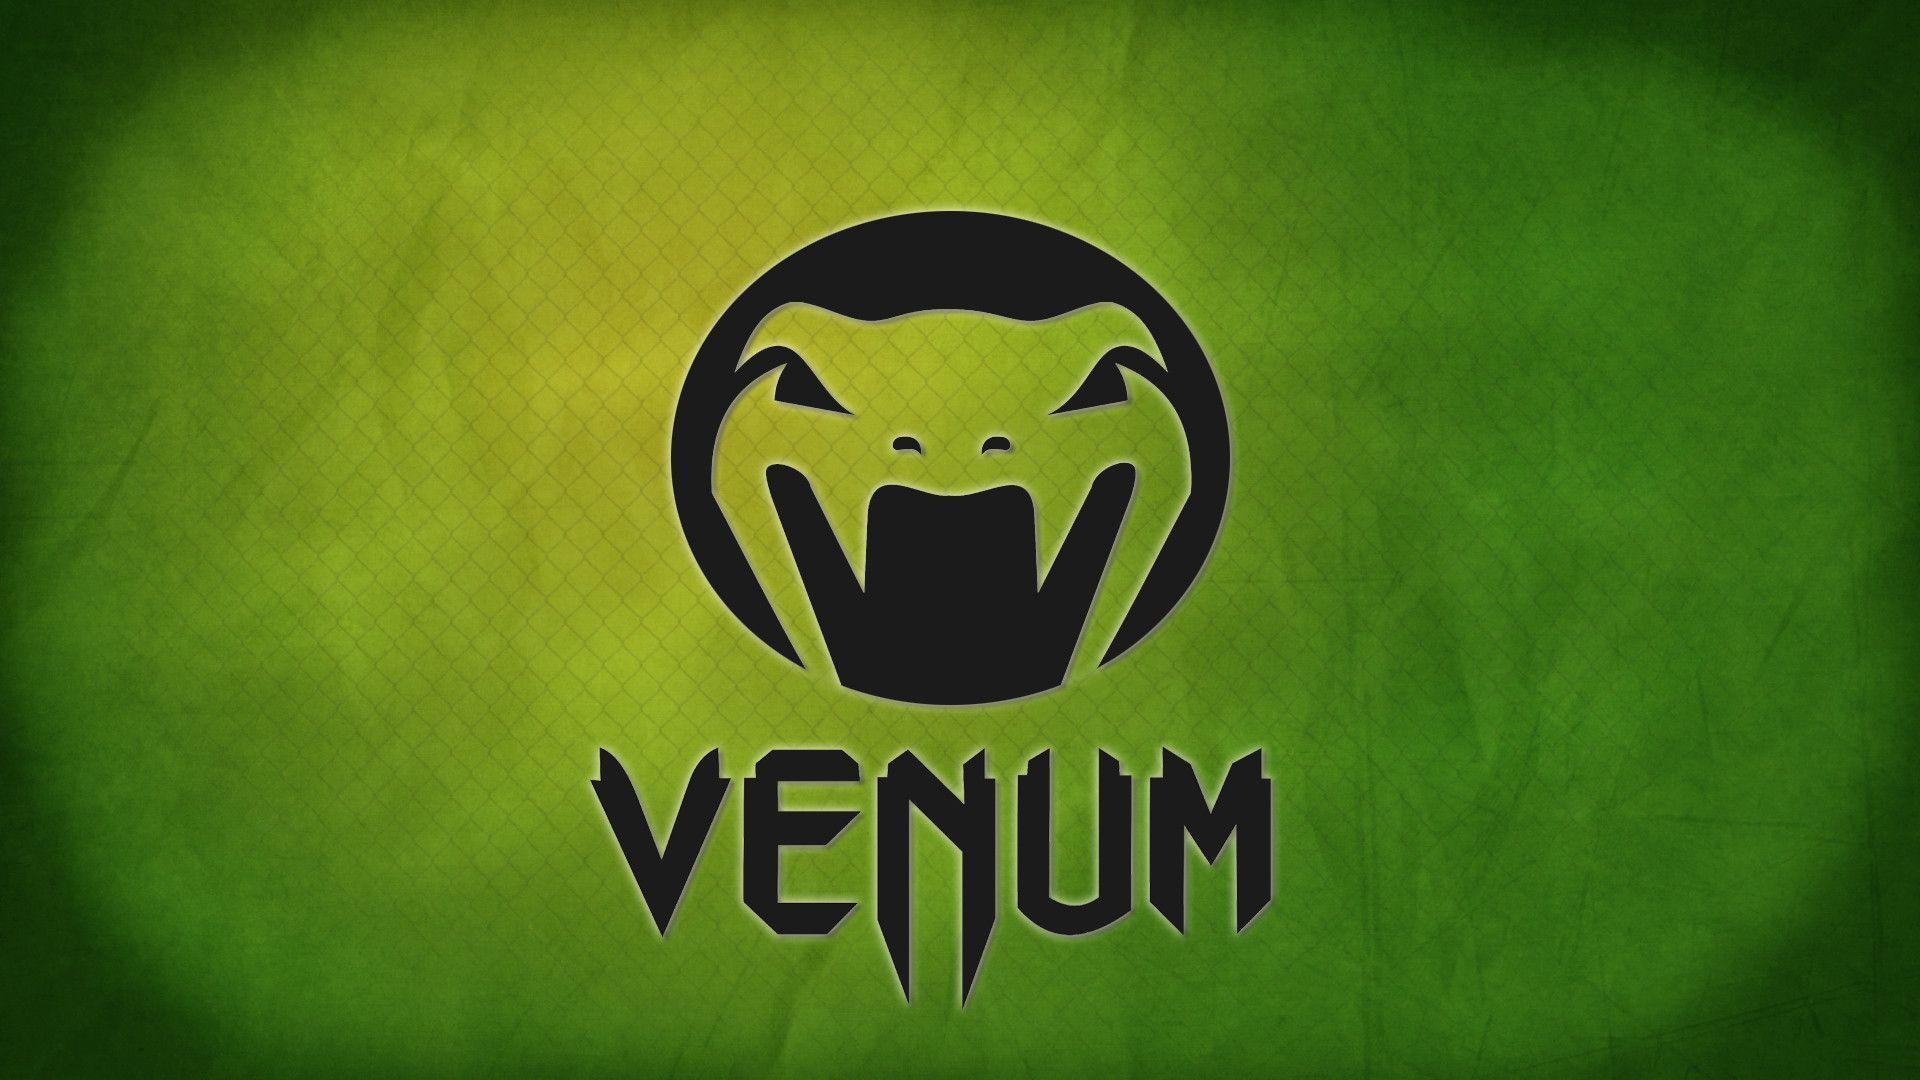 venum logo wallpaper - photo #1